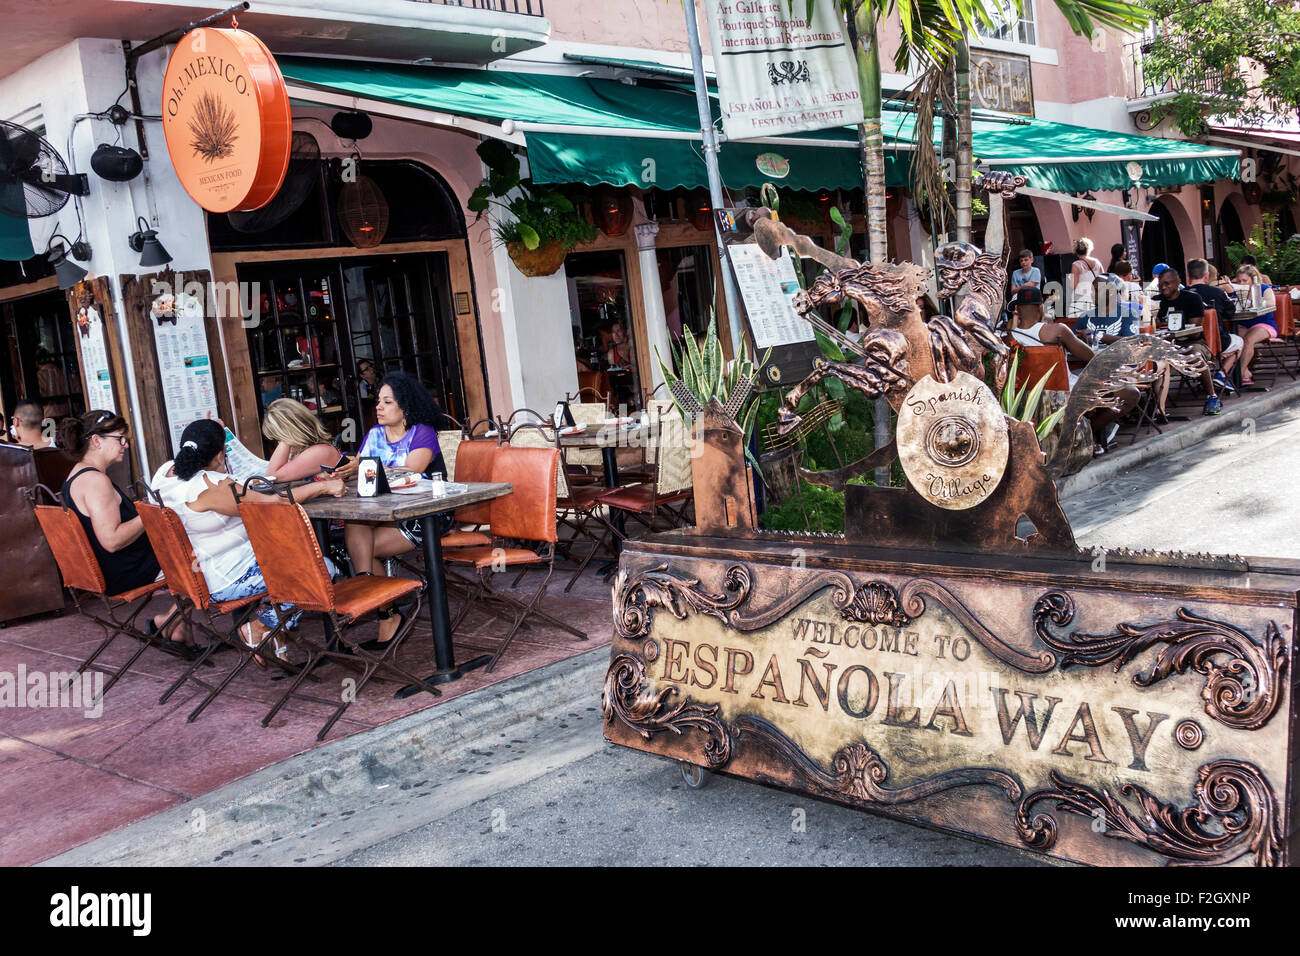 Mexican Restaurants South Beach Miami Florida